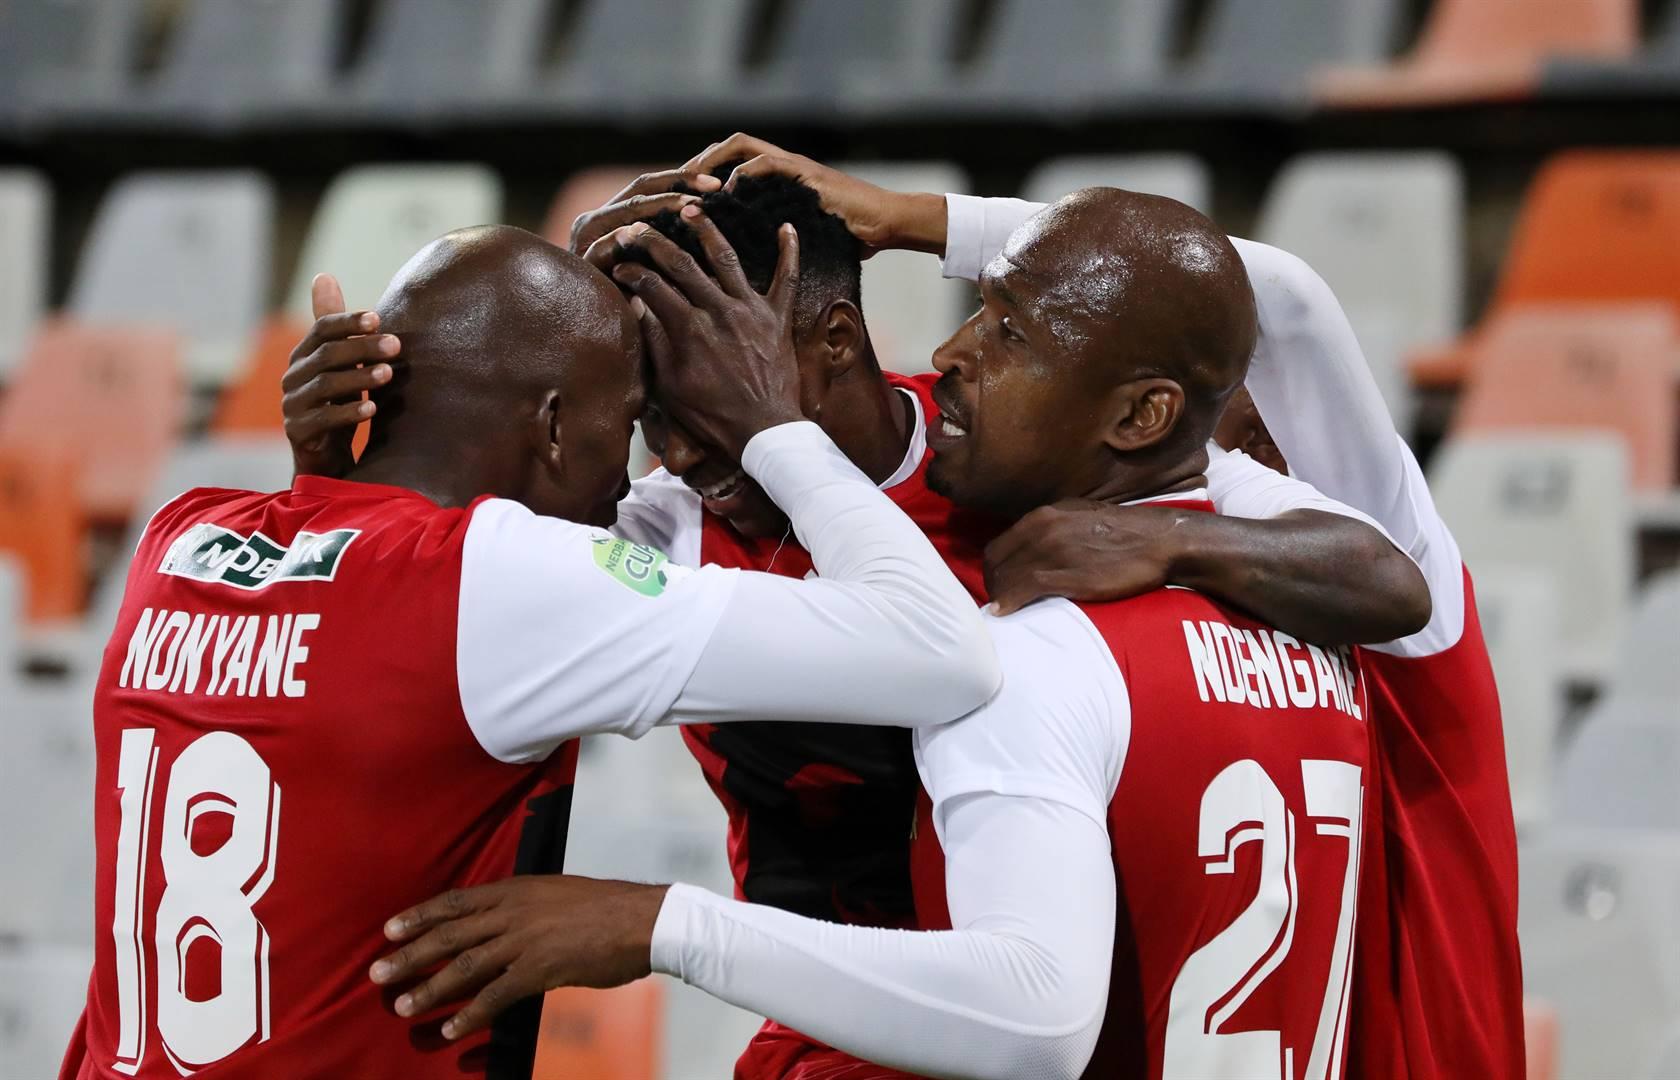 Tshakhuma players embrace Ndabayithethwa Ndlondlo, who scored against Chippa United in the Nedbank Cup final at Free State Stadium in Bloemfontein on Saturday. Photo: Muzi Ntombela / BackpagePix